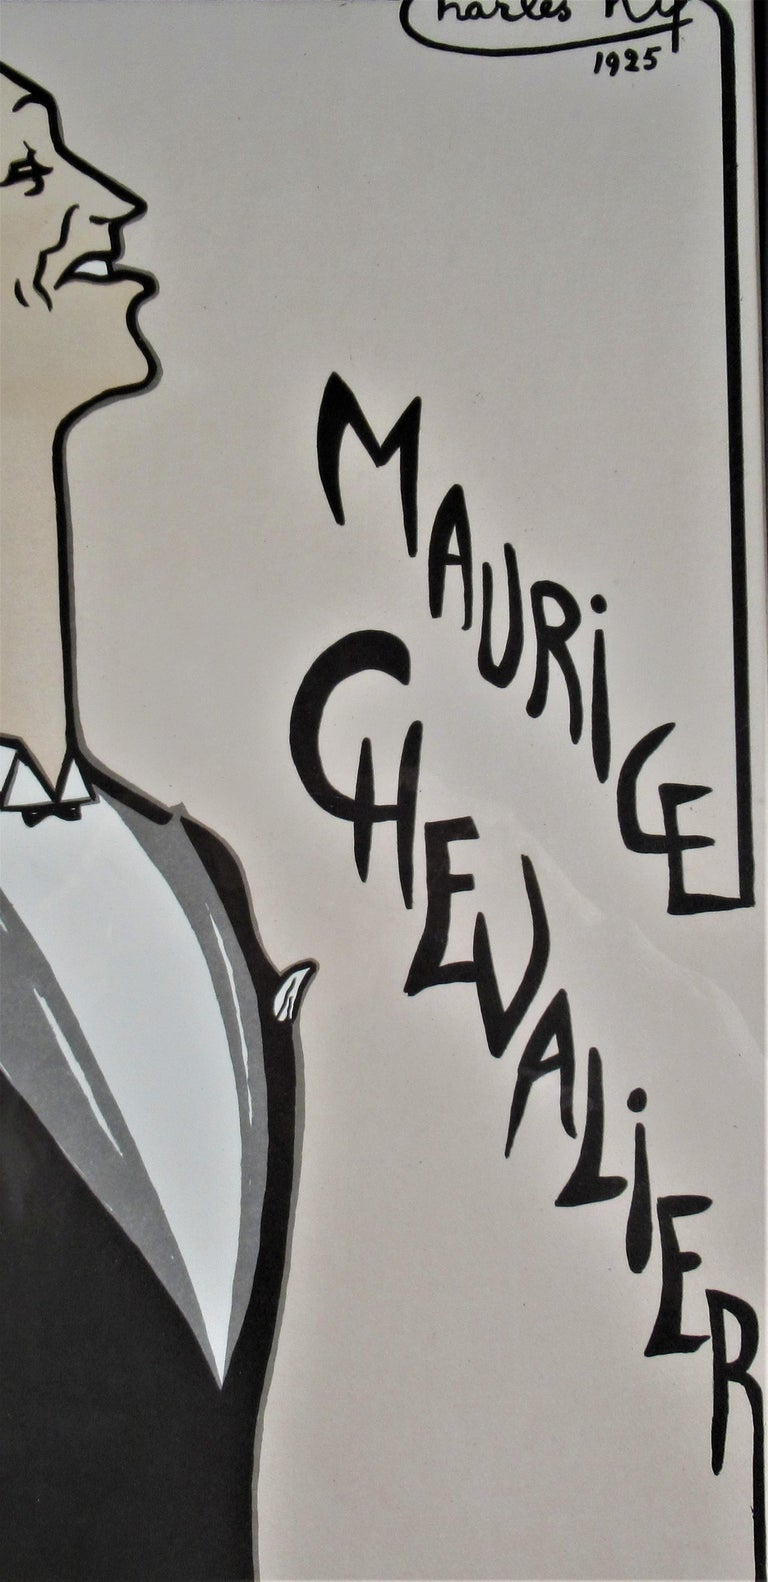 Maurice Chevalier, Casino de Paris  - Gray Figurative Print by Charles Kiffer